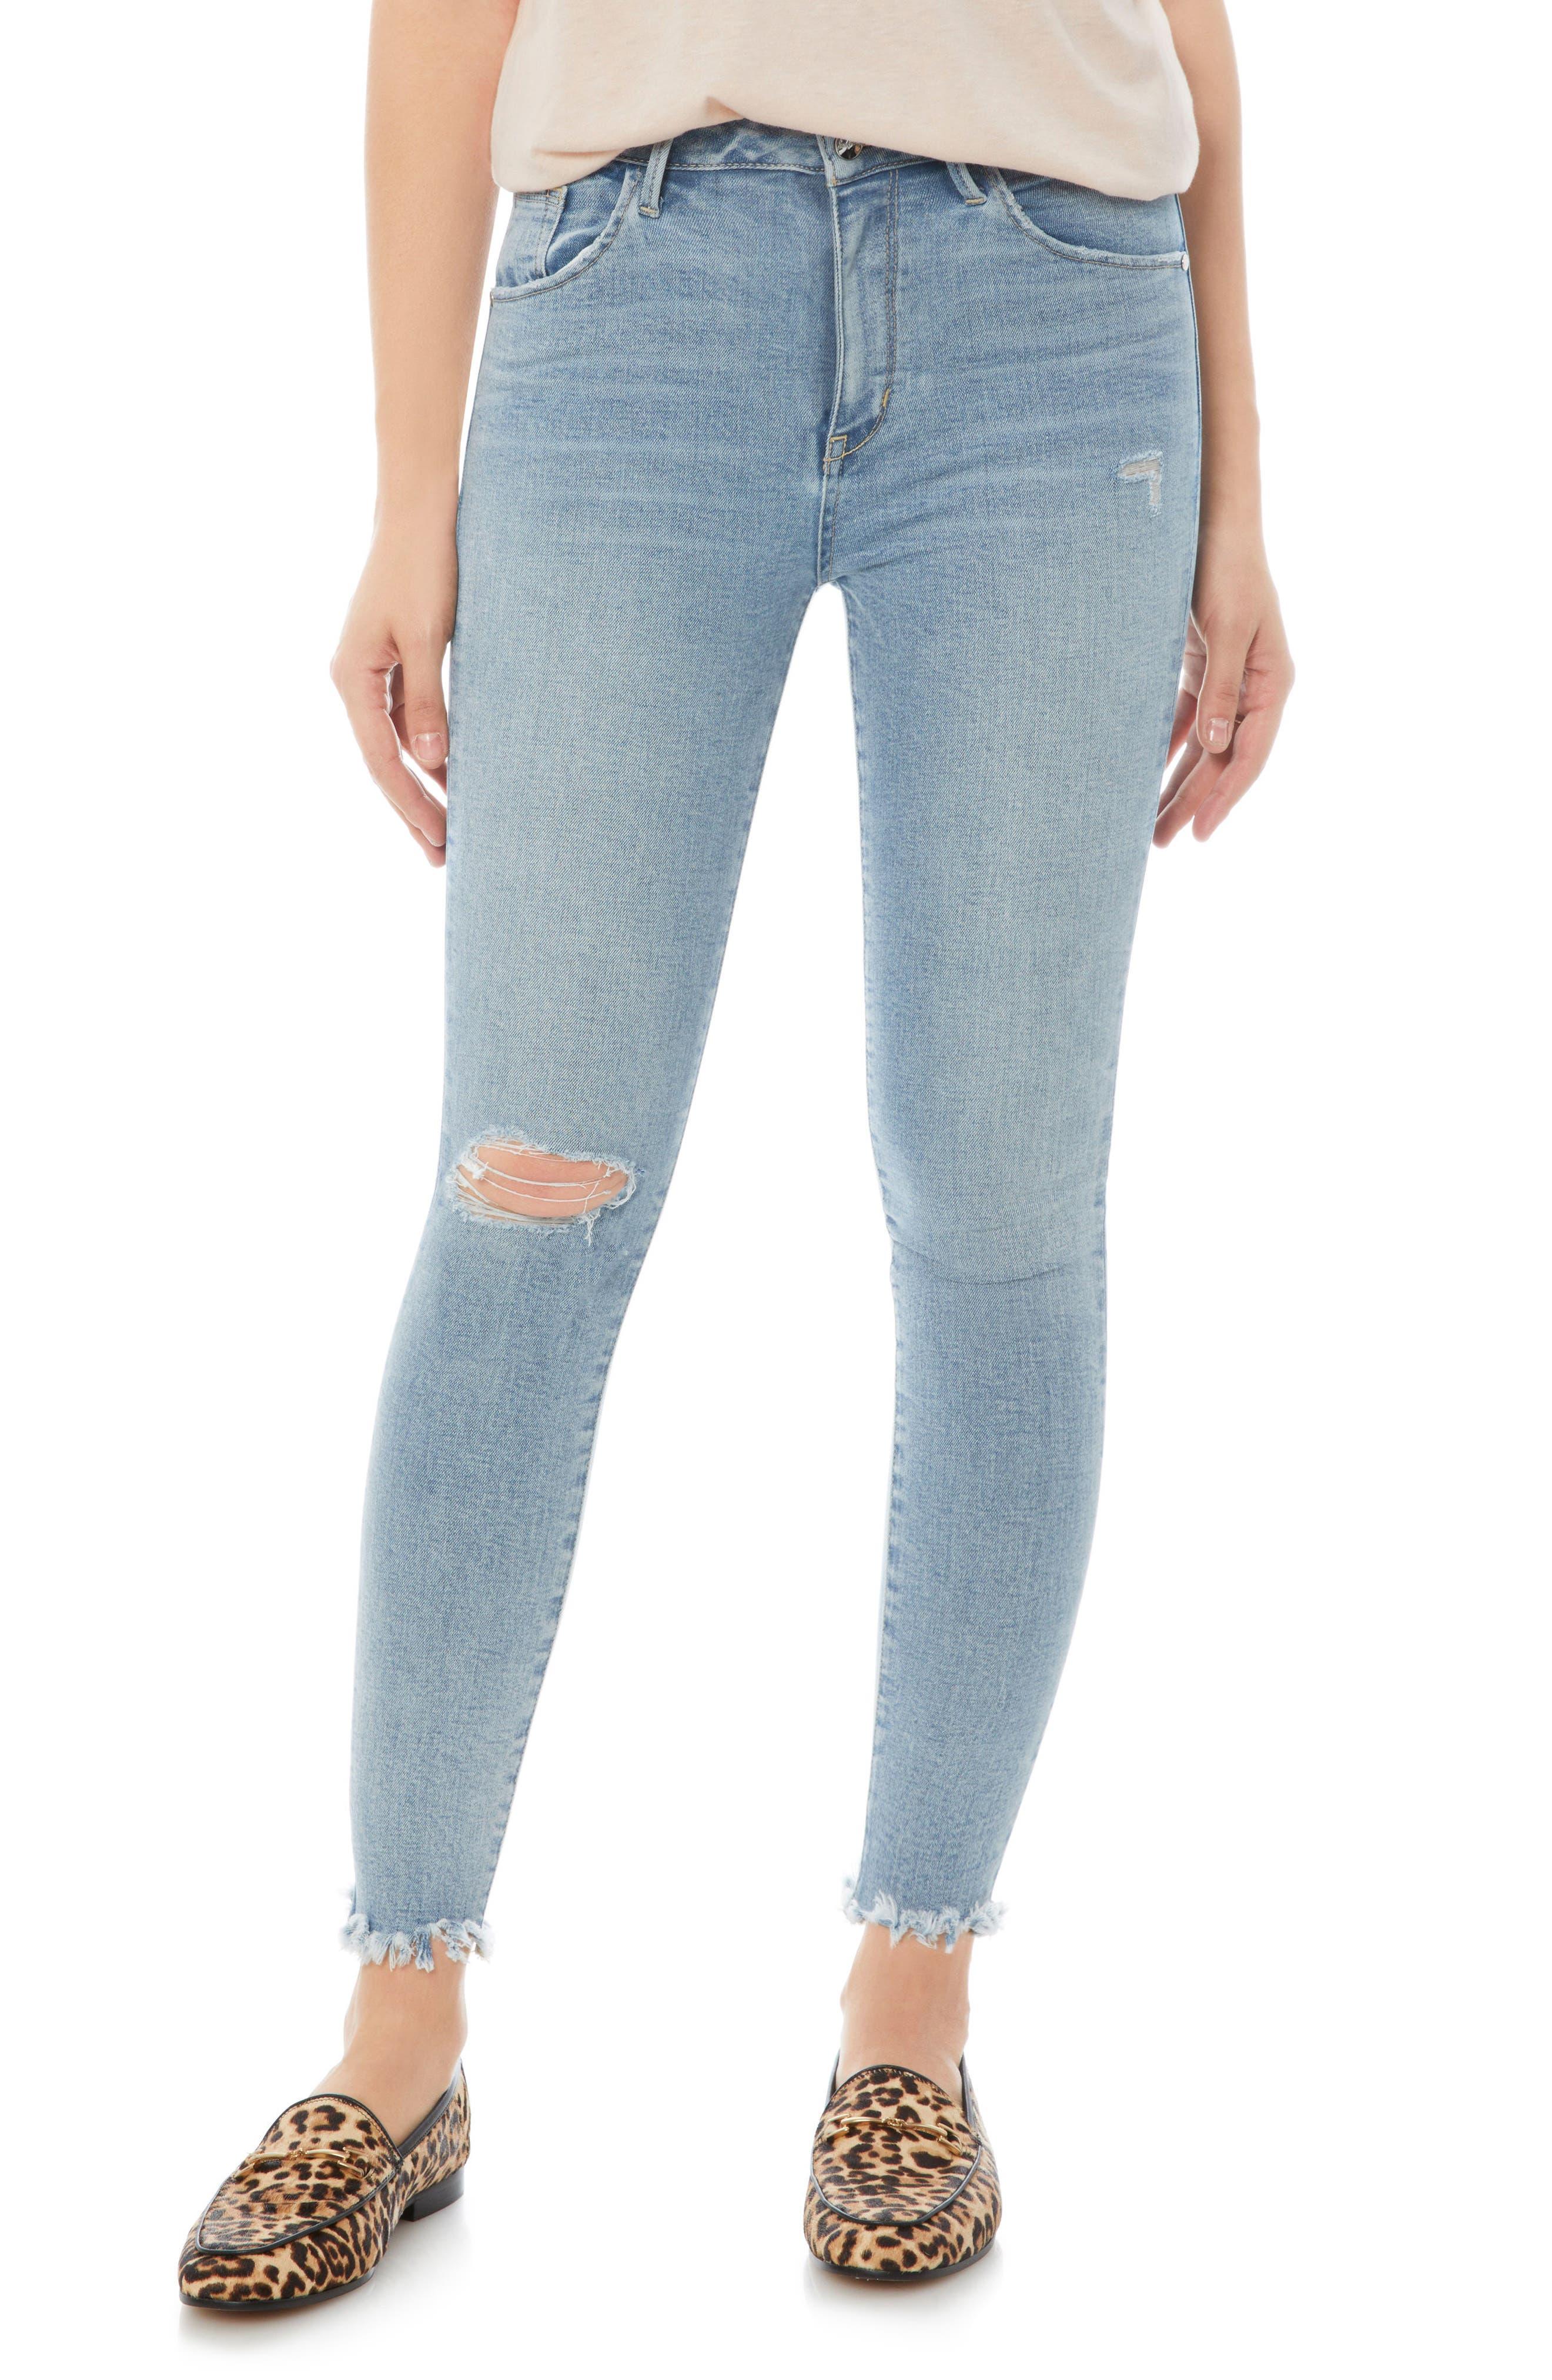 Alternate Image 1 Selected - Sam Edelman The Stiletto Ripped Fringe Jeans (Honor)